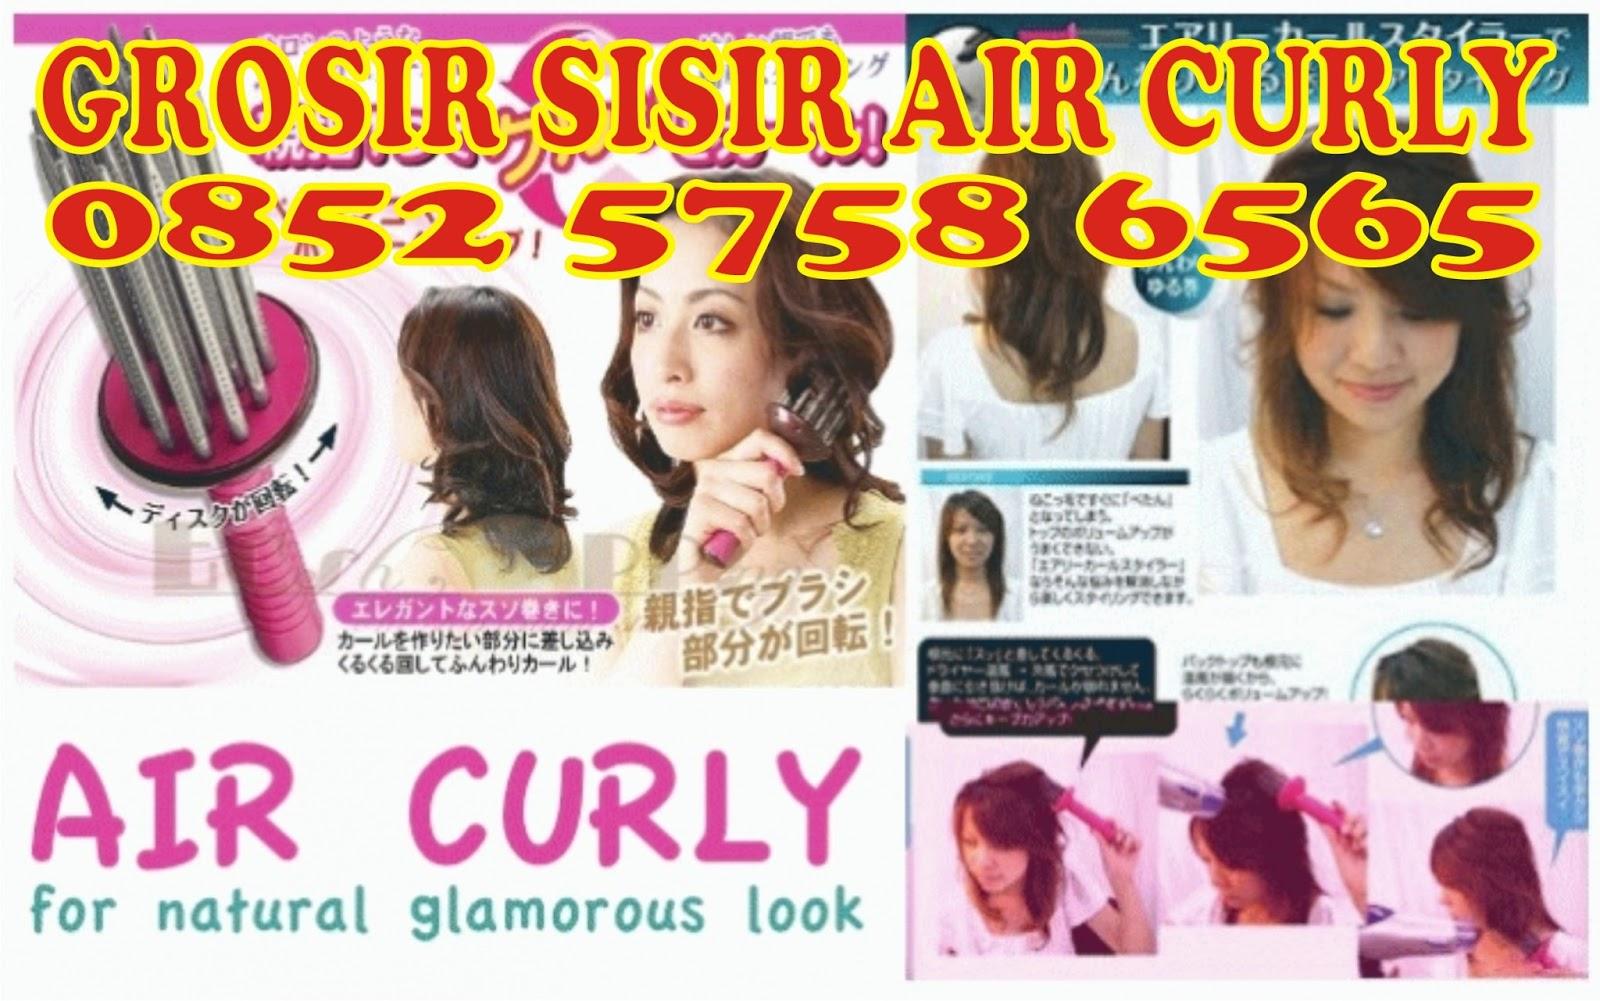 Alat Rambut Salon Kecantikan Buat Keriting Air Curly Hair Styler Sisir By Bu Vero Diposting Oleh Grosir Airy